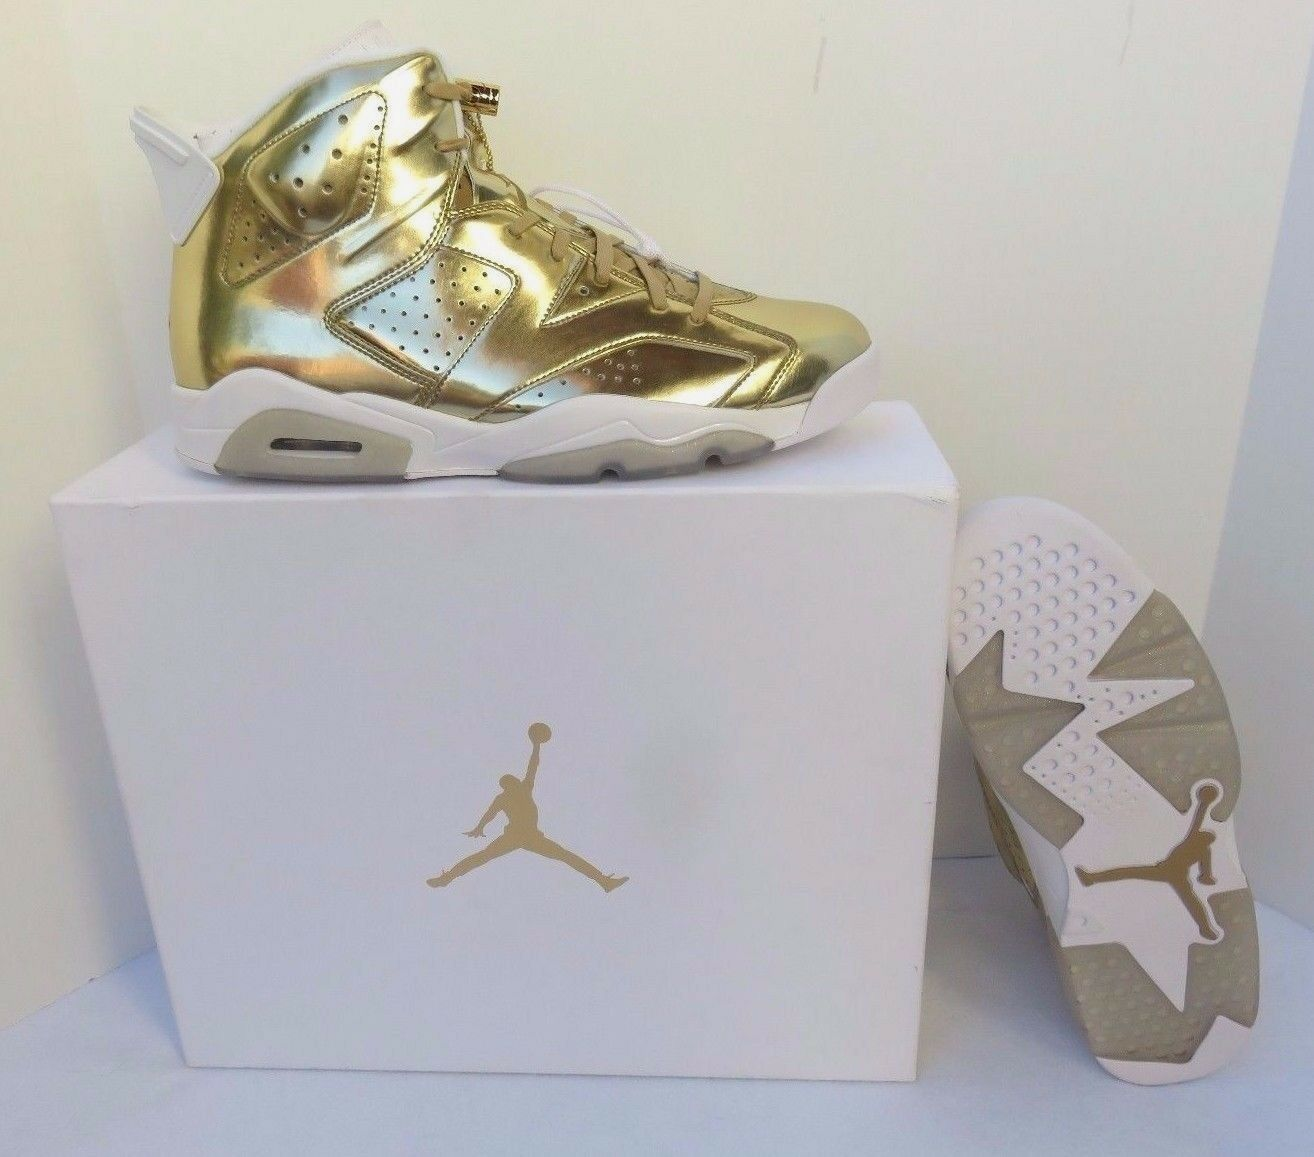 Nike air jordan 6 retrò pinnacle oro - dimensioni, il sergente w / box e borsa